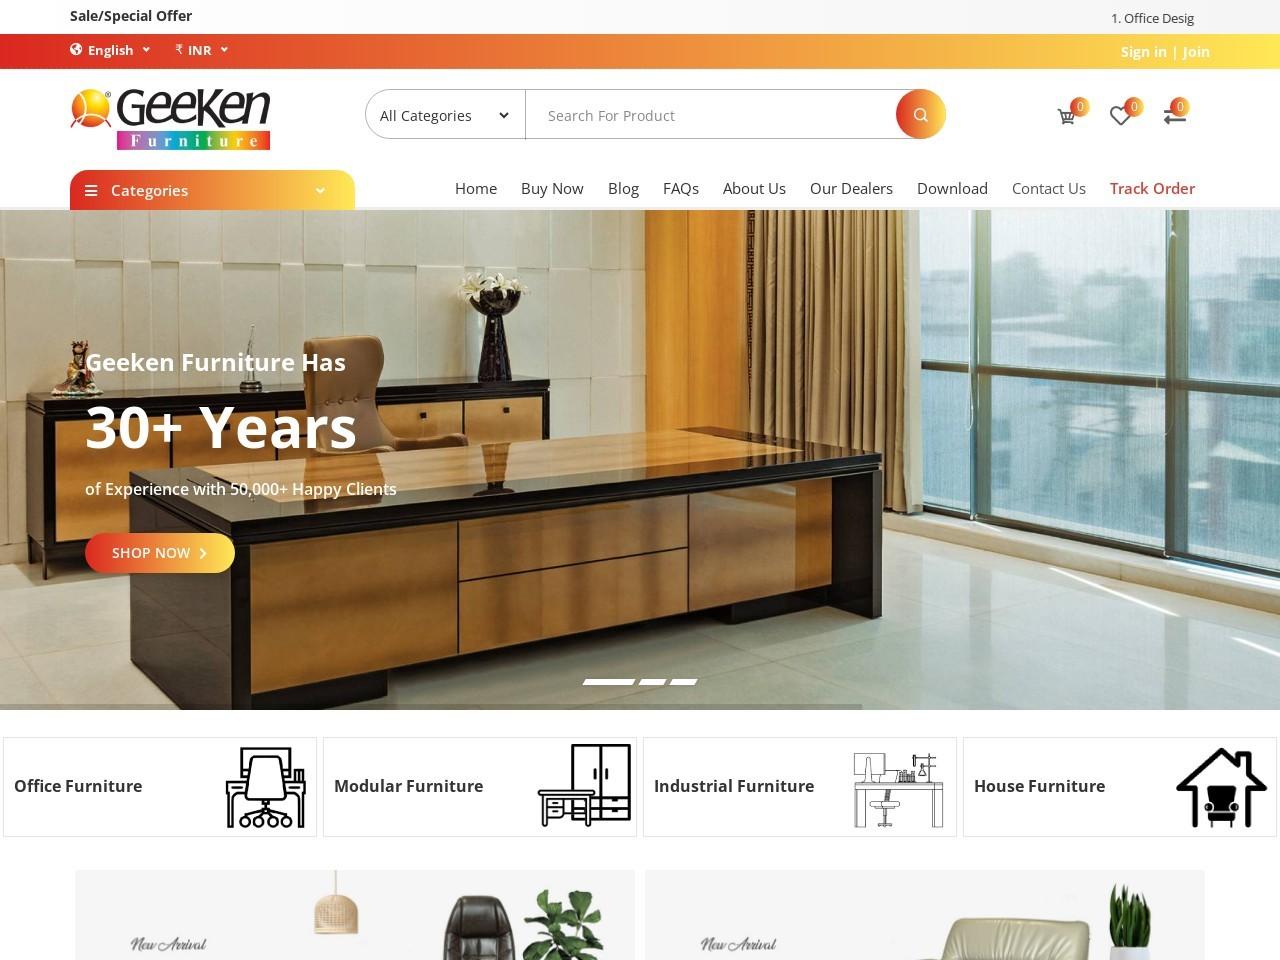 geeken revolving chair 5 position floor seating collection pvt ltd office chairs manufacturer computer supplier